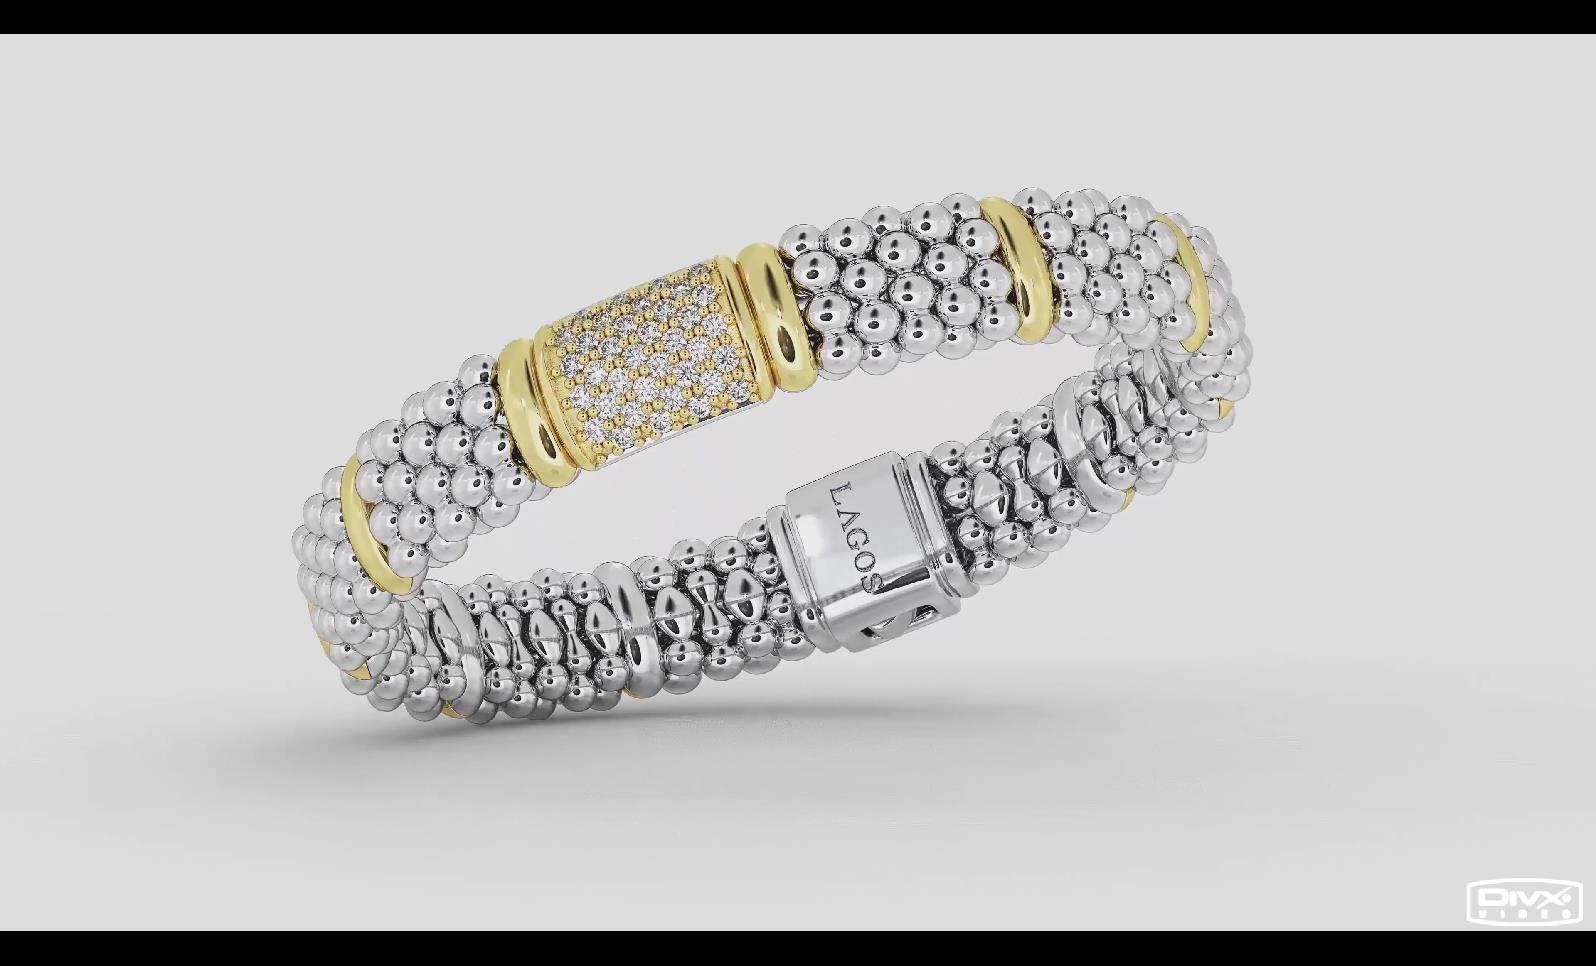 BS 089 BS 69 4K钻戒展示 珠宝工艺 珠宝设计 珠宝展示_1